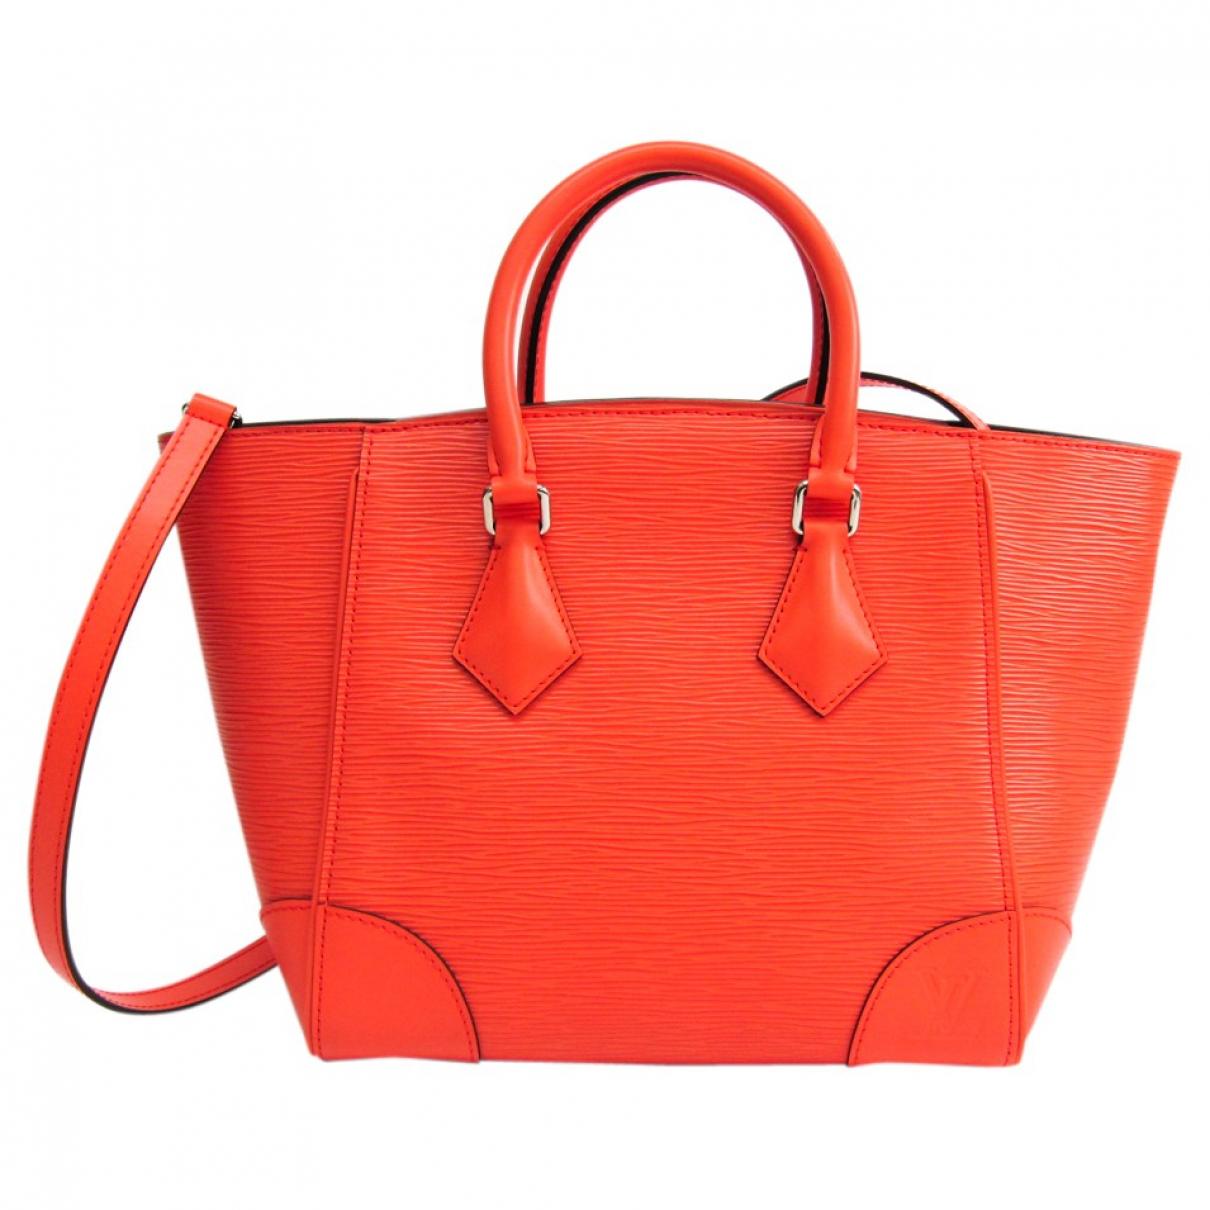 Louis Vuitton Phenix Red Leather handbag for Women N